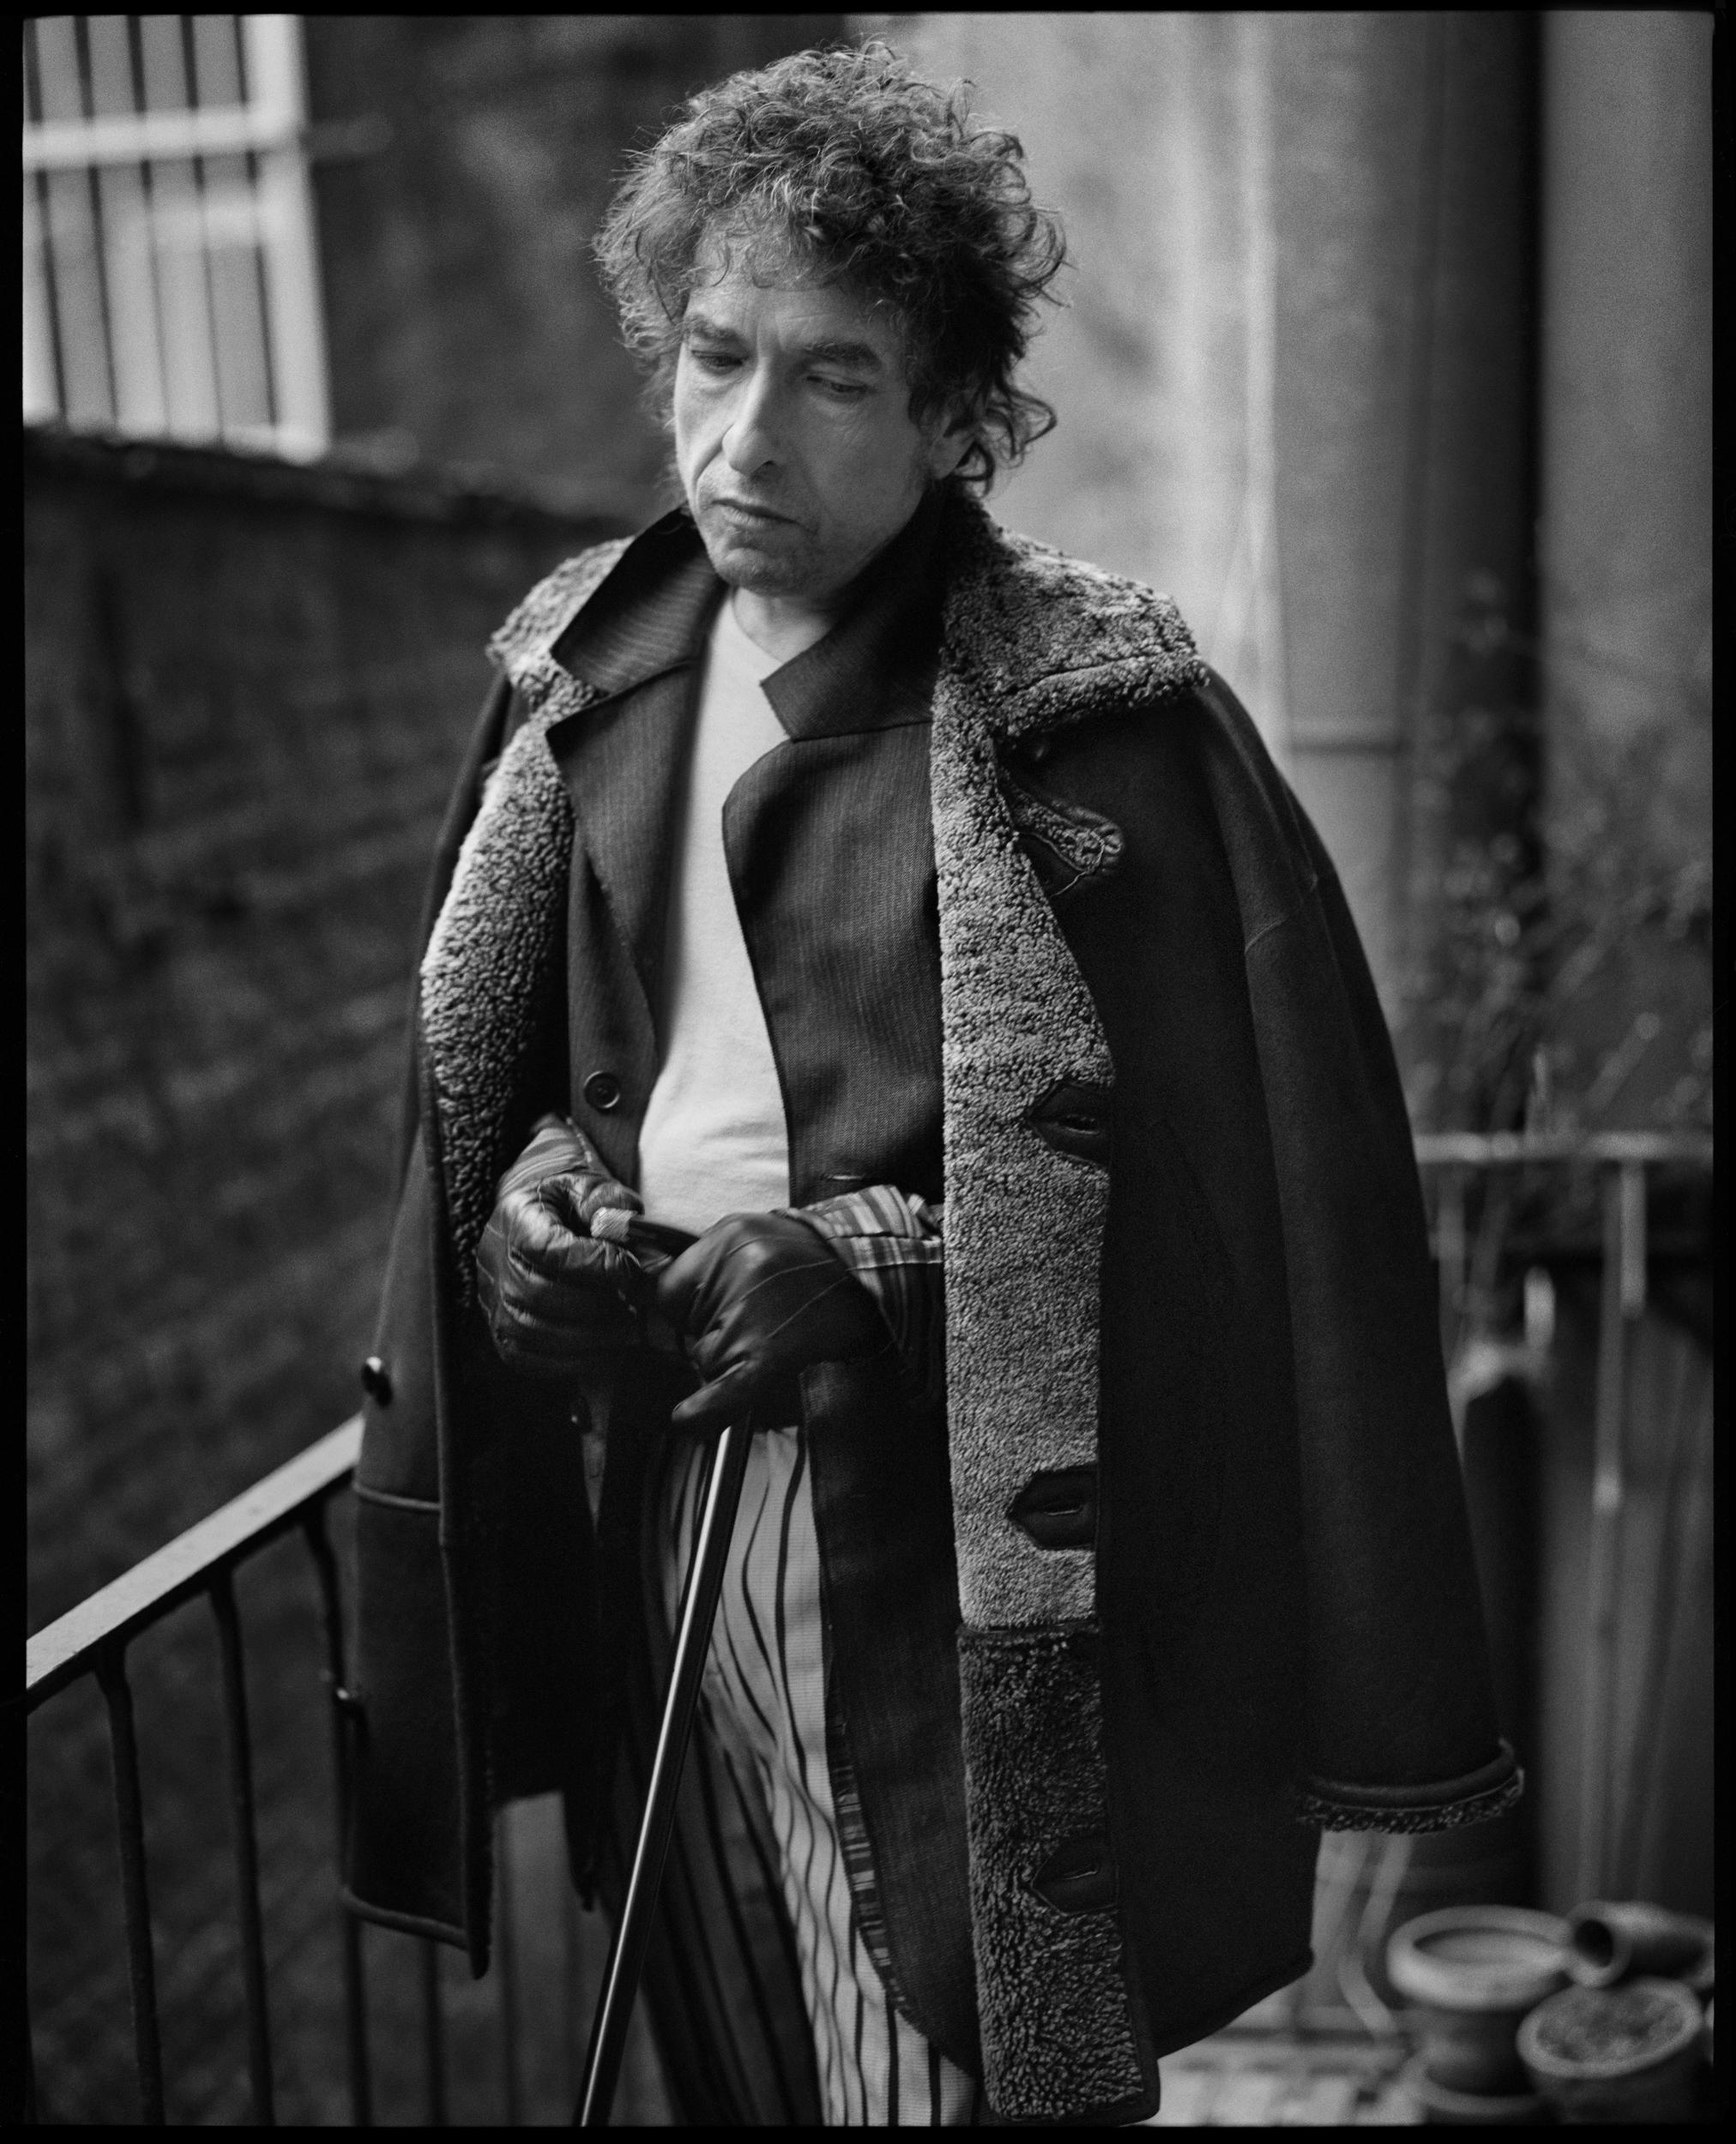 Bob Dylan, New York, NY 1995